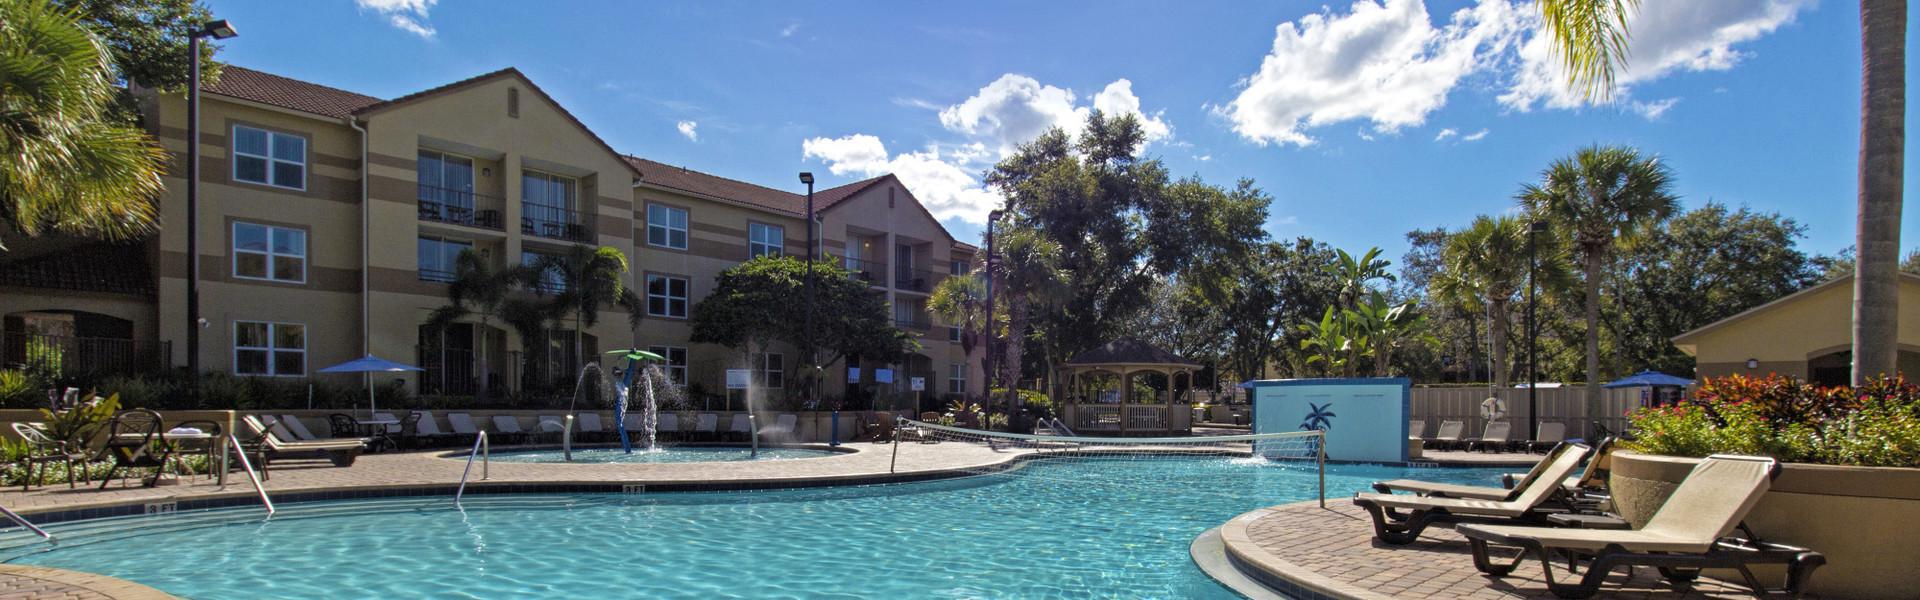 Westgate Blue Tree Resort Overivew in Lake Buena Vista Florida | Resorts Near Sea World, FL 32836 | Lake Buena Vista Hotels